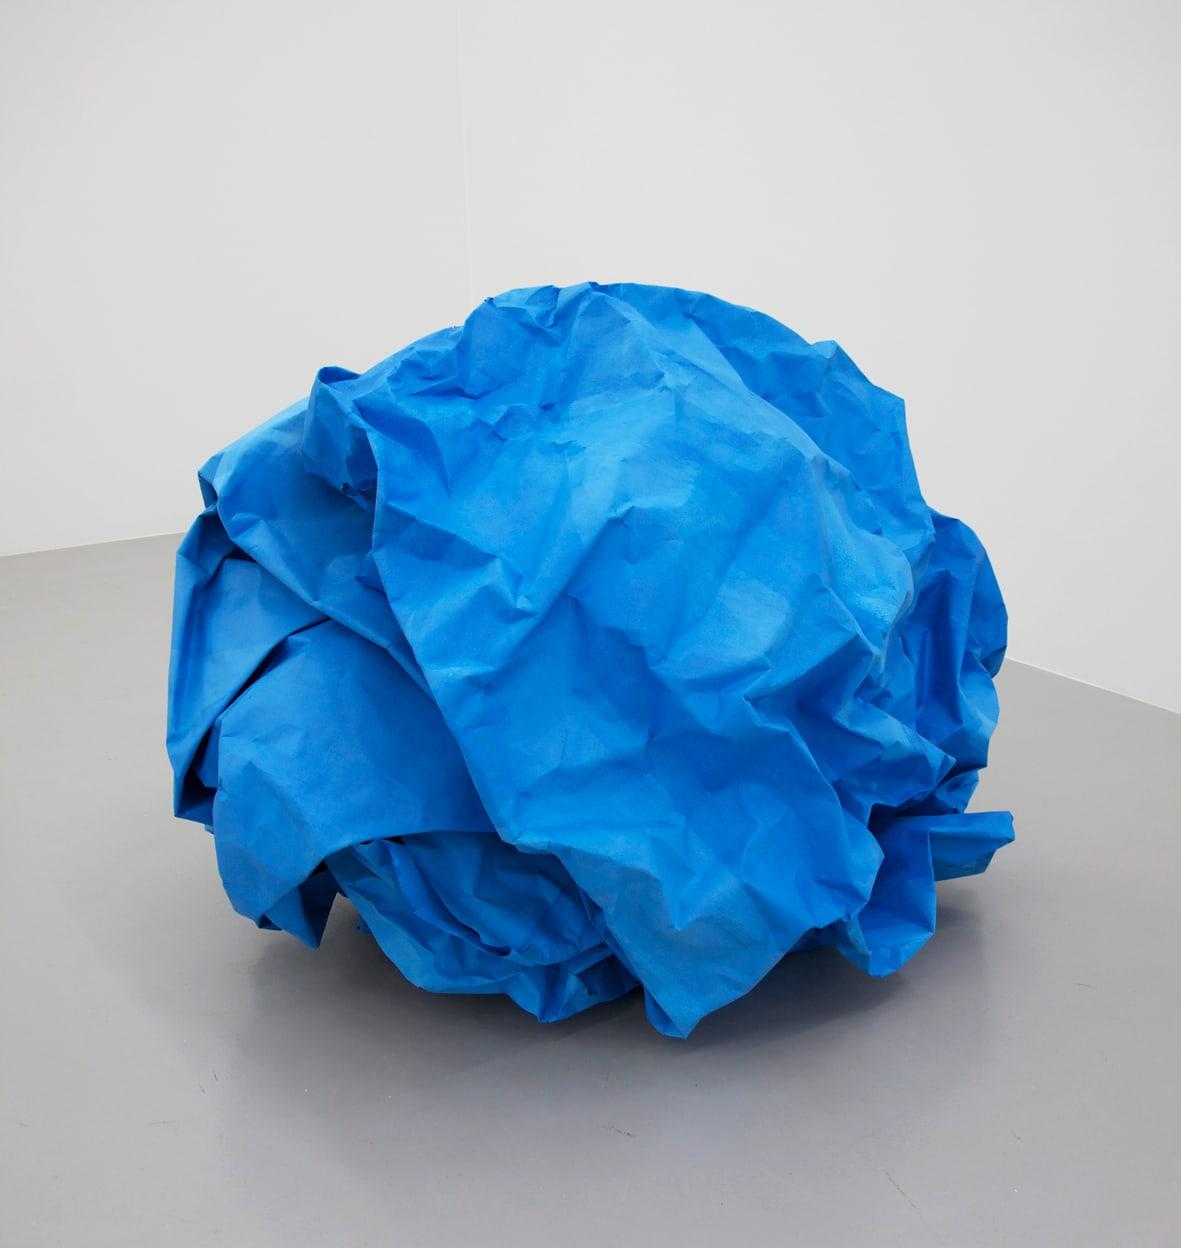 "<span class=""link fancybox-details-link""><a href=""/exhibitions/117/works/artworks7084/"">View Detail Page</a></span><div class=""artist""><strong> Ivar Valgarðsson</strong></div><div class=""title""><em>Watercolour / Vatnslitamynd</em>, 2011</div><div class=""medium"">watercolour on paper</div><div class=""dimensions"">height: 110 cm<br>diameter: about 120 cm</div>"